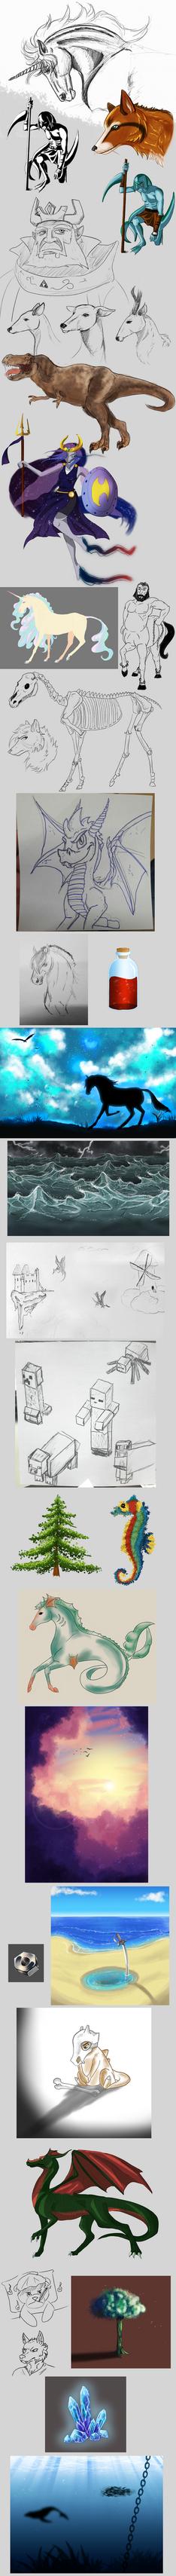 Daily drawing : October by Caronat